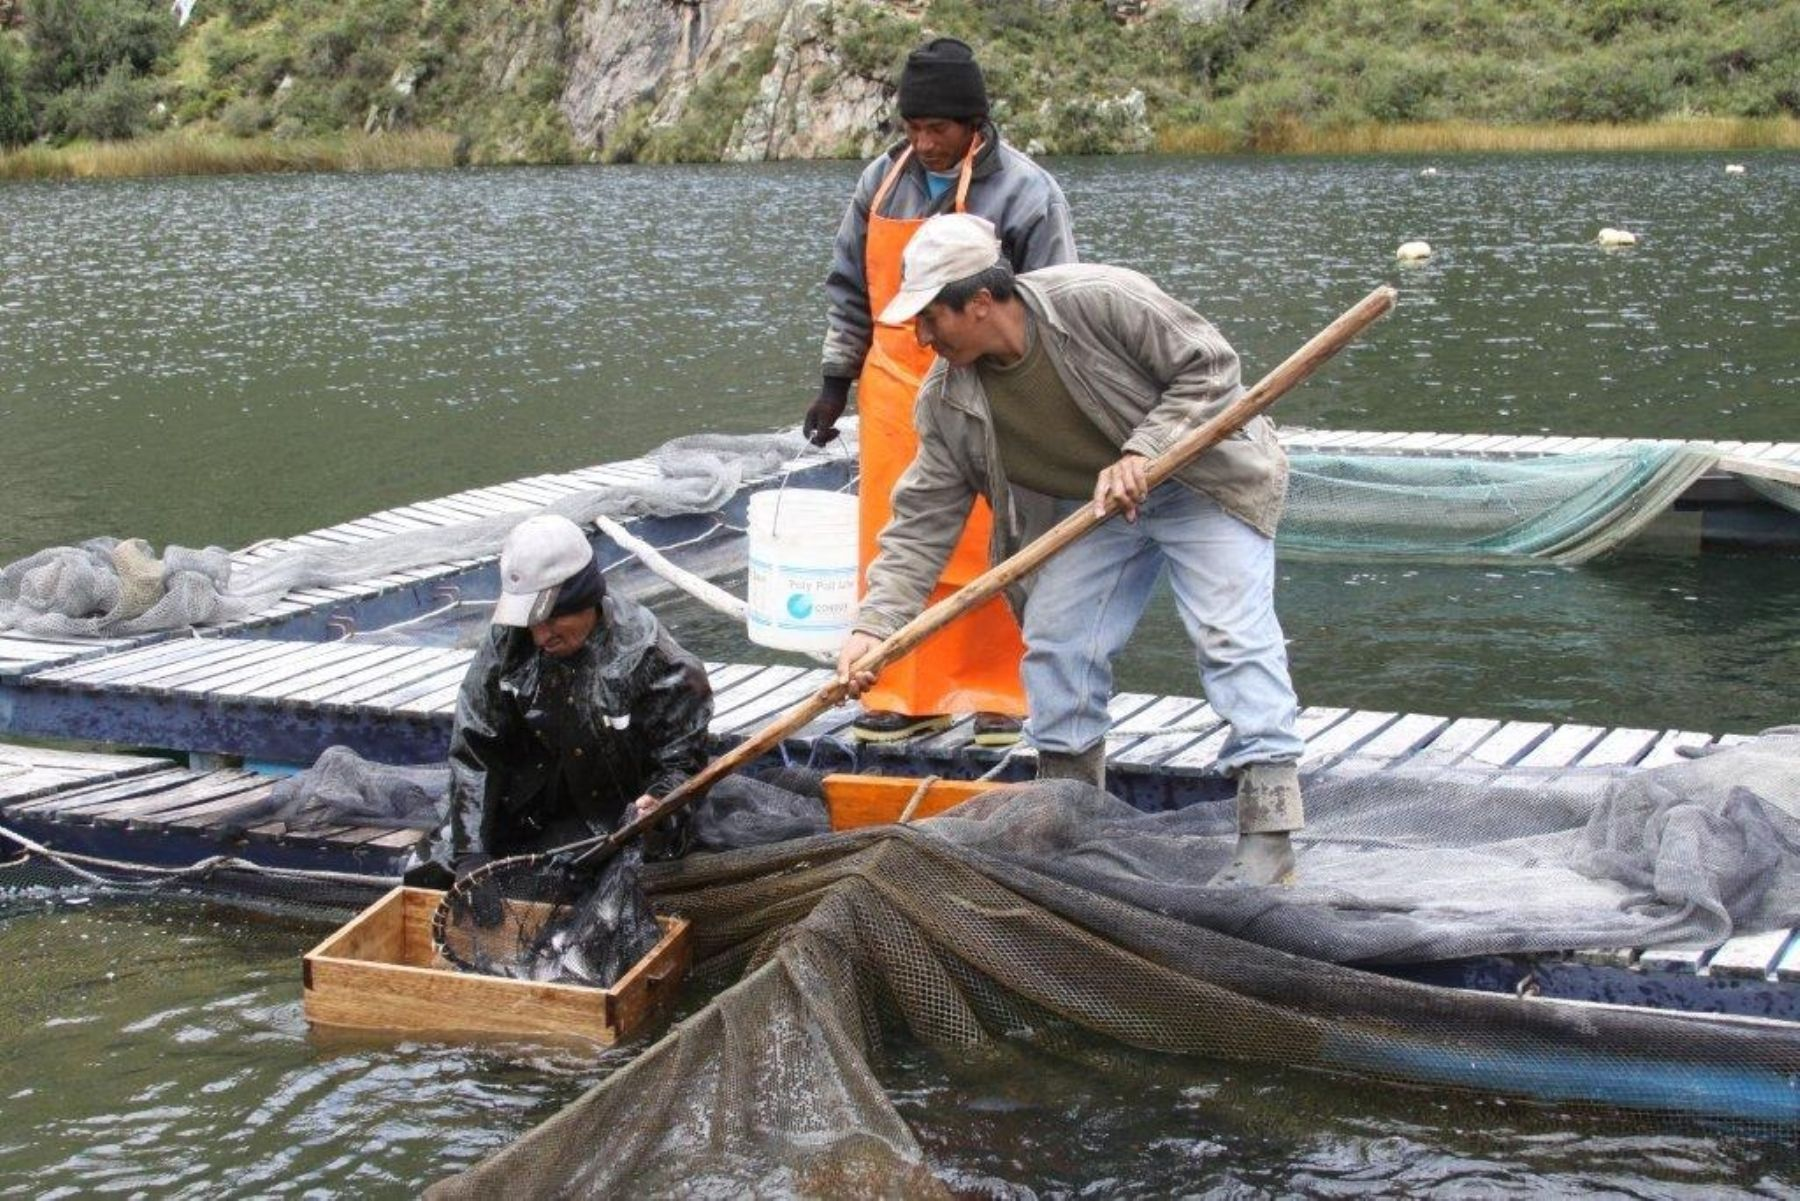 Comunidad campesina de yauyos apunta a producir 70 for Jaulas flotantes para piscicultura